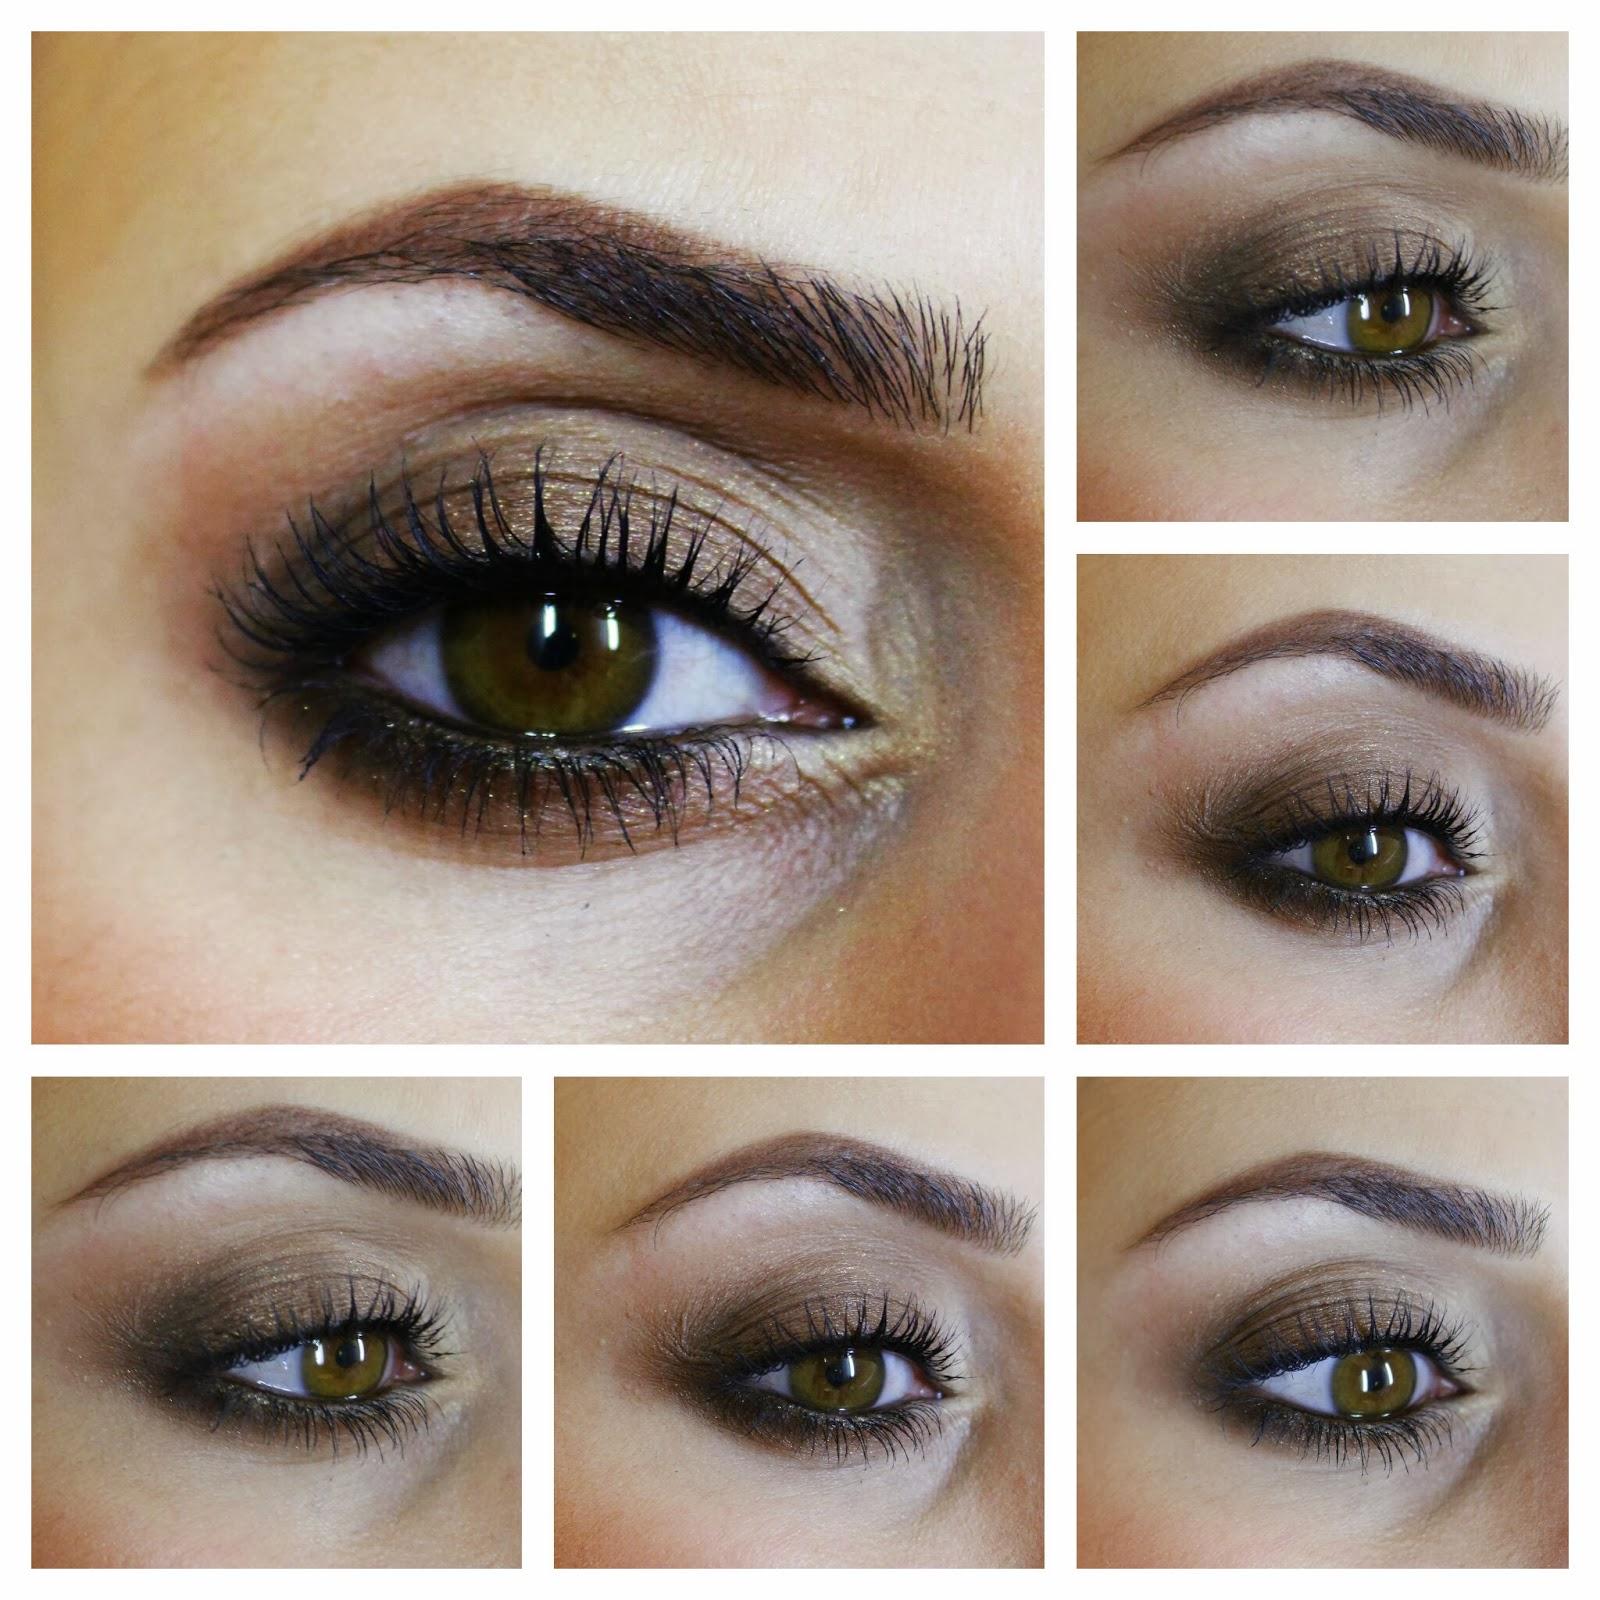 apolosophy eyeshadow palette